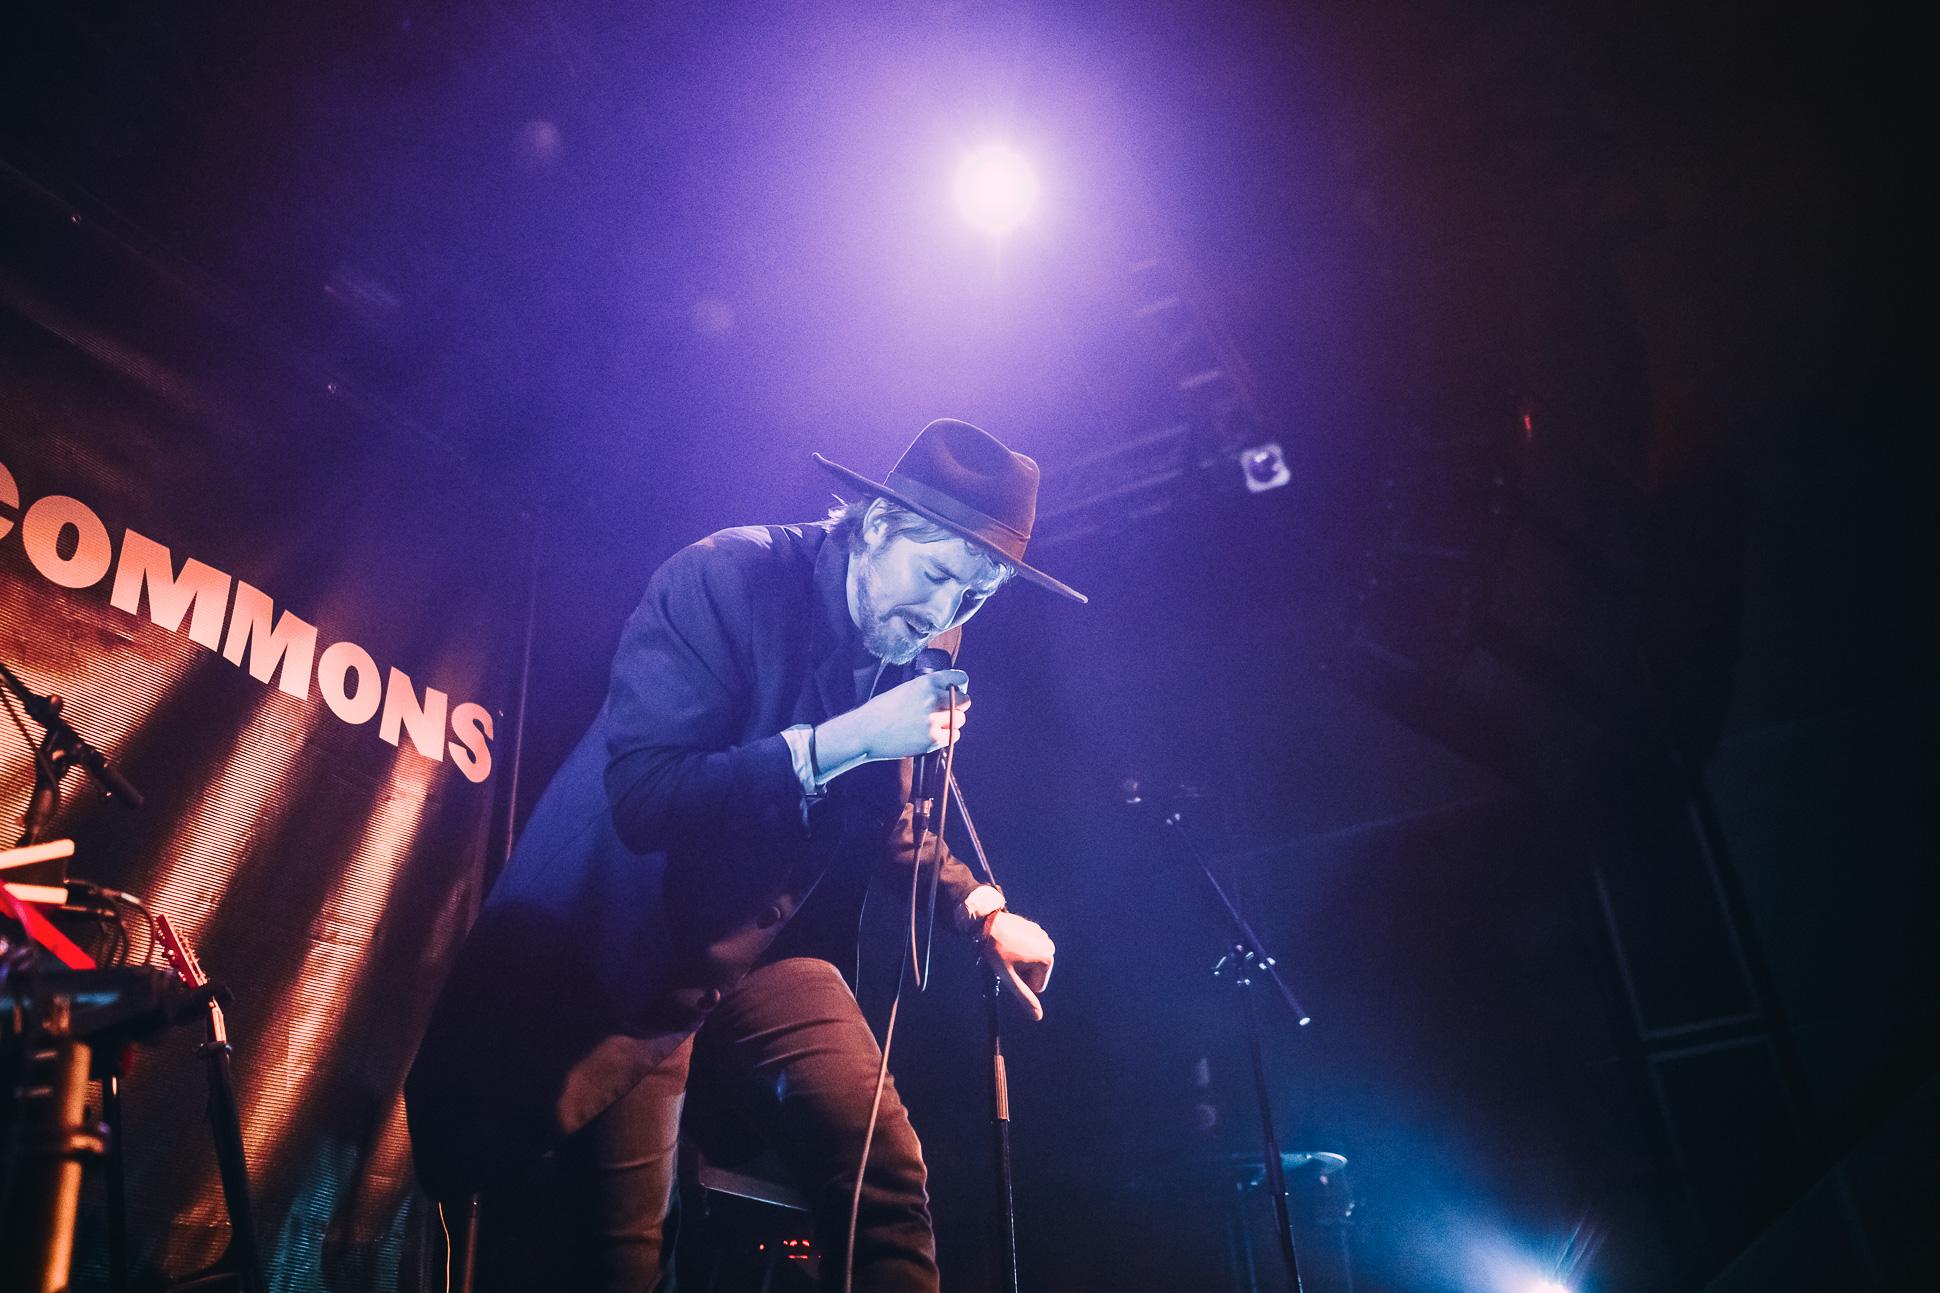 JamieNCommons-VENUE-19-01-2019-Vancouver-14.jpg